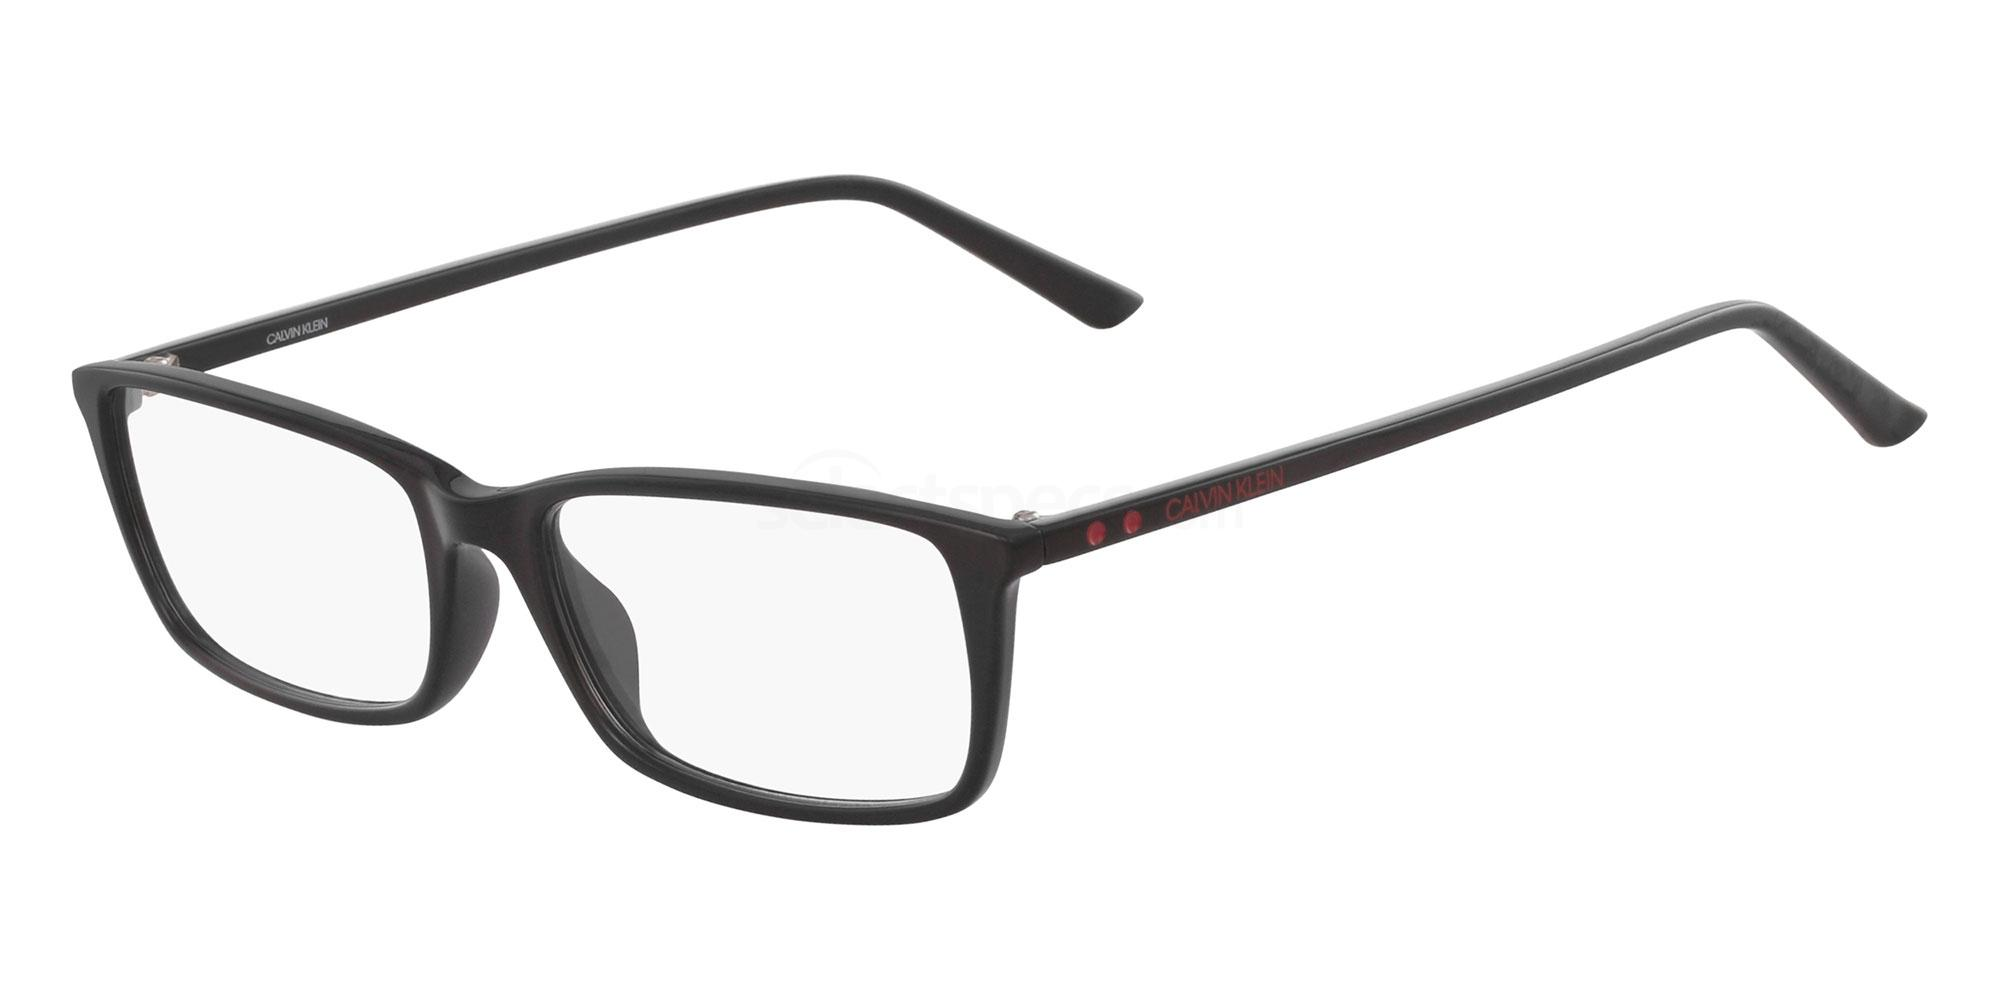 001 CK18544 Glasses, Calvin Klein